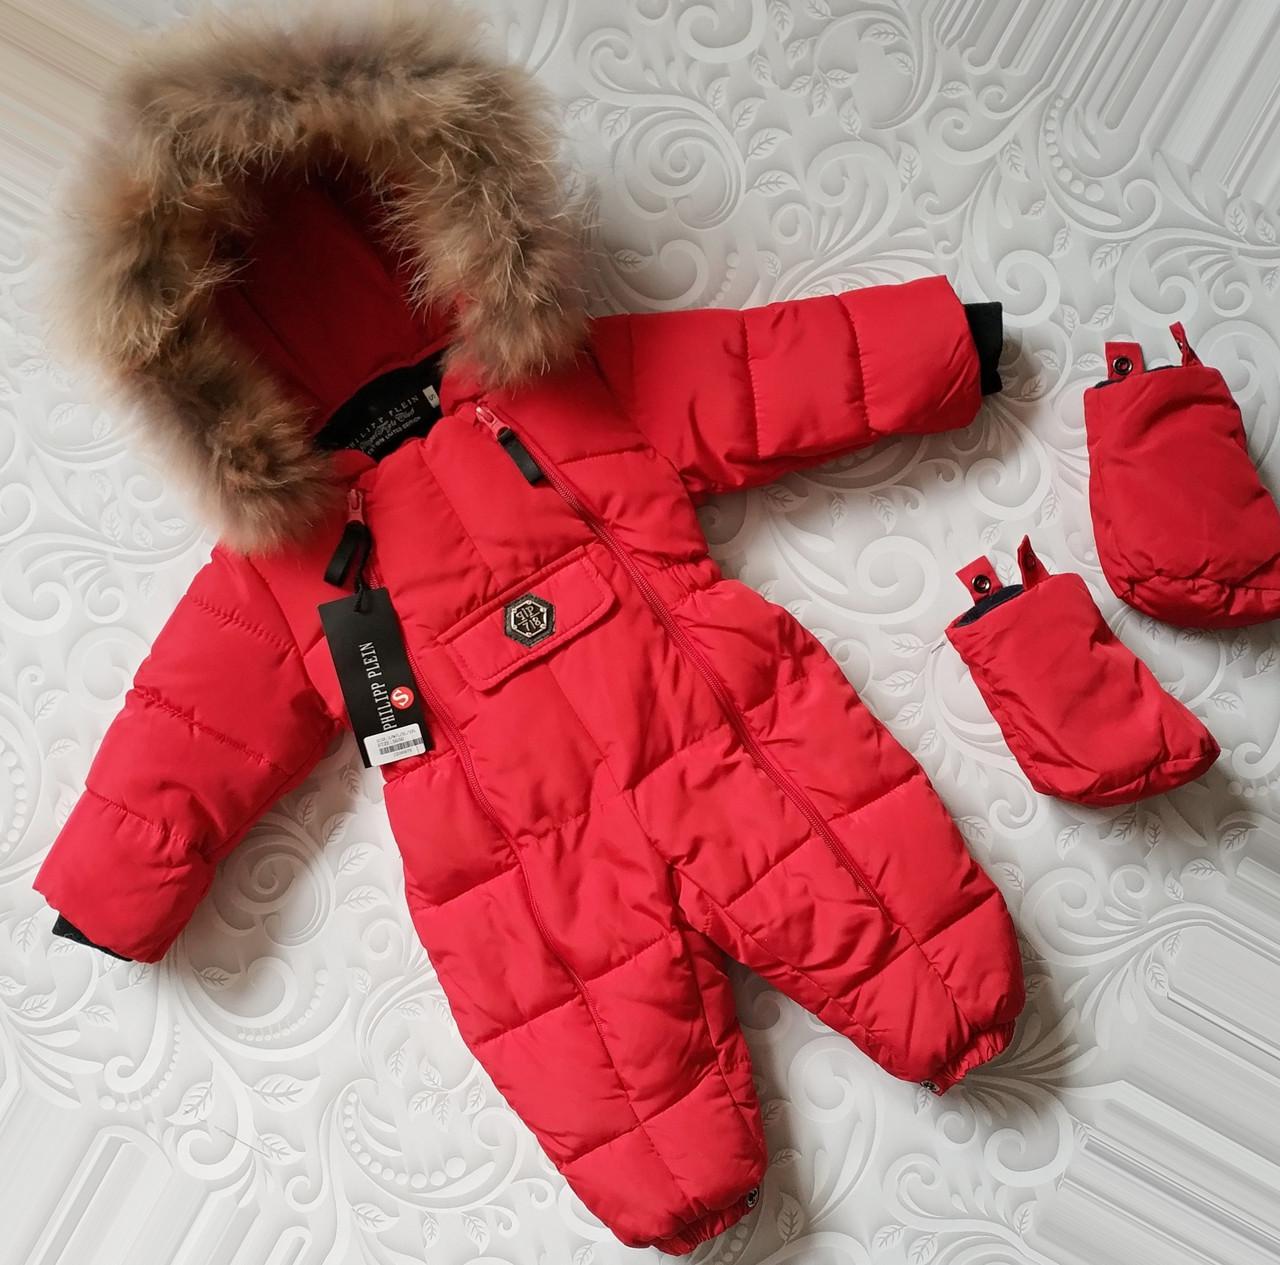 Зимний, красный комбинезон Philipp plein